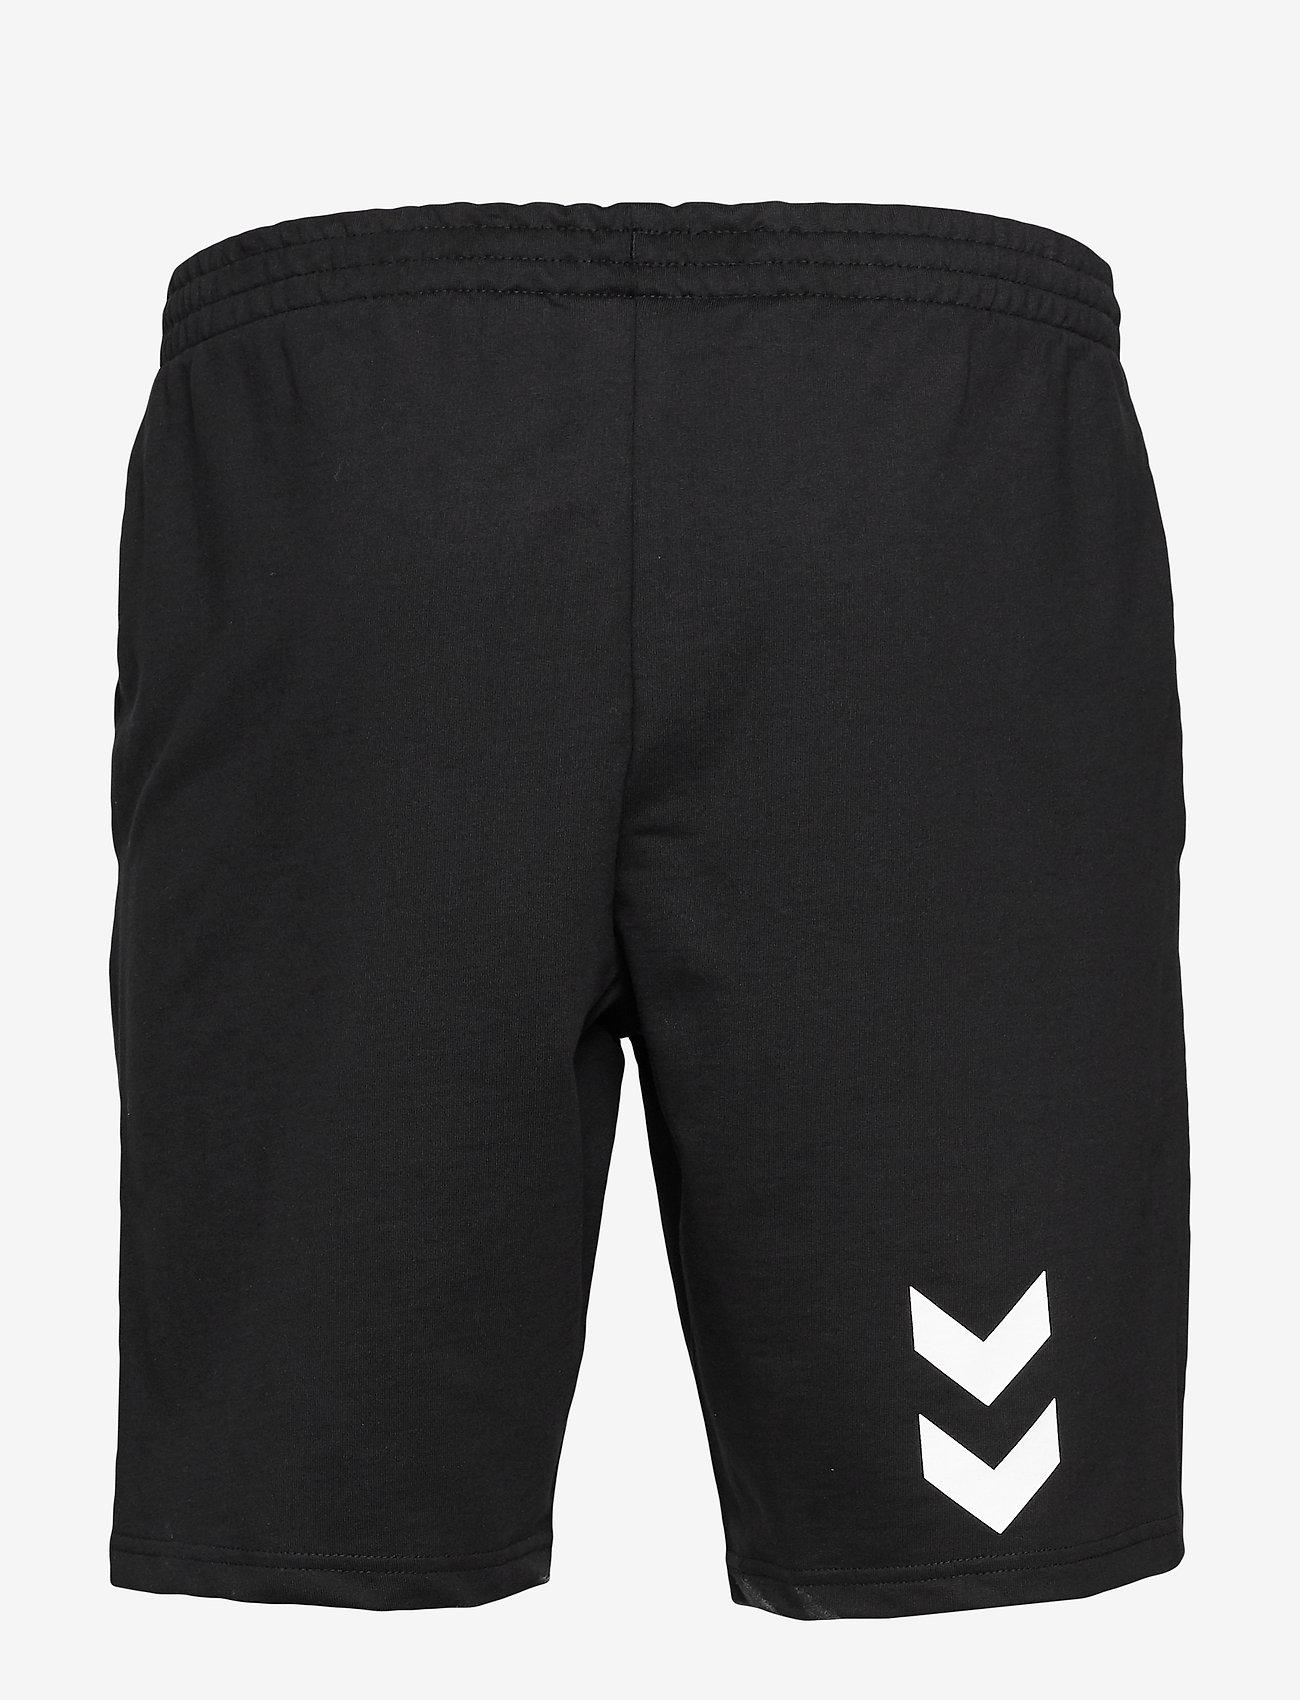 Hummel - HMLGO COTTON BERMUDA SHORTS - casual shorts - black - 1